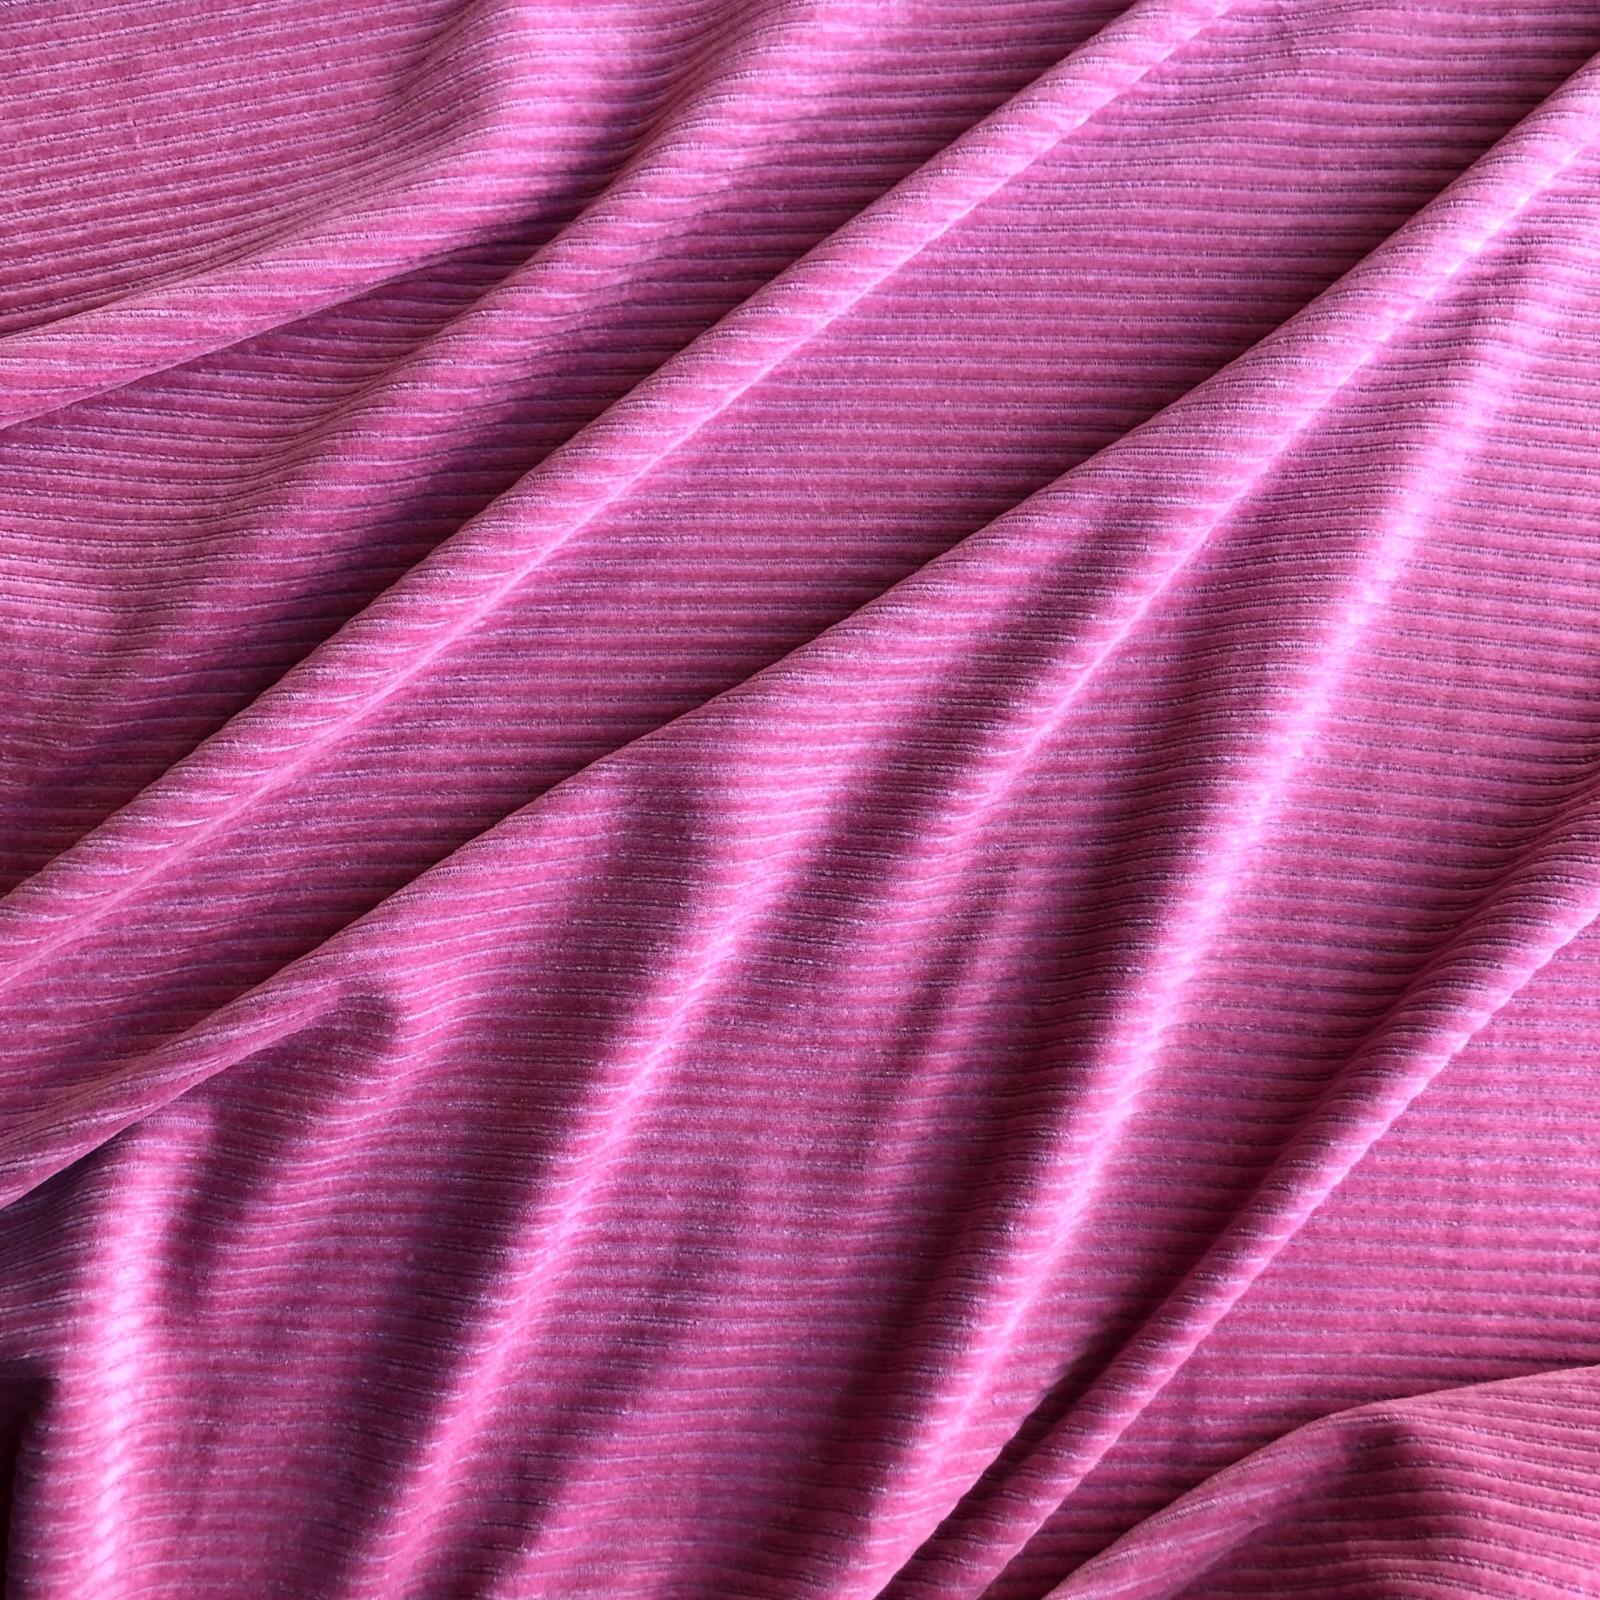 Velour Corduroy Stretch Knit - Dusty Rose 62